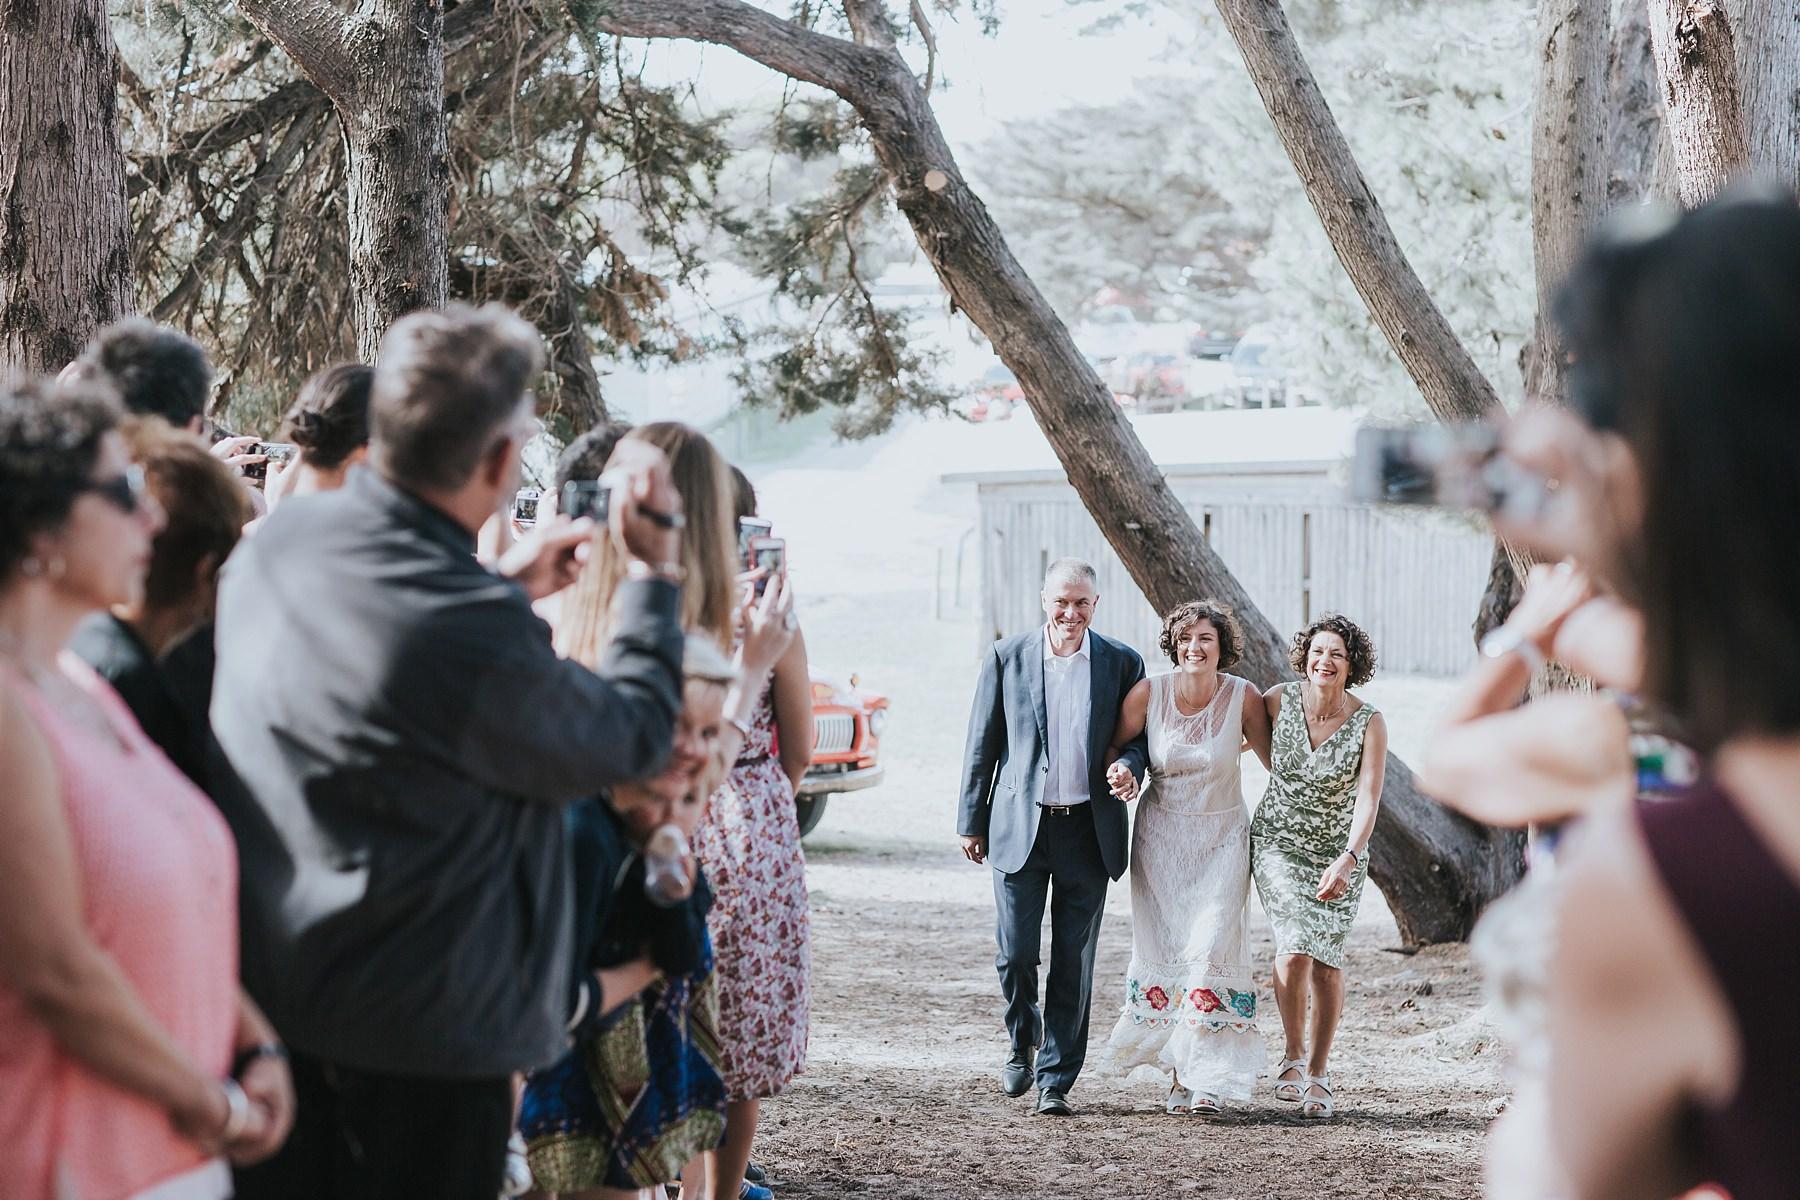 brides parents walking her down the aisle